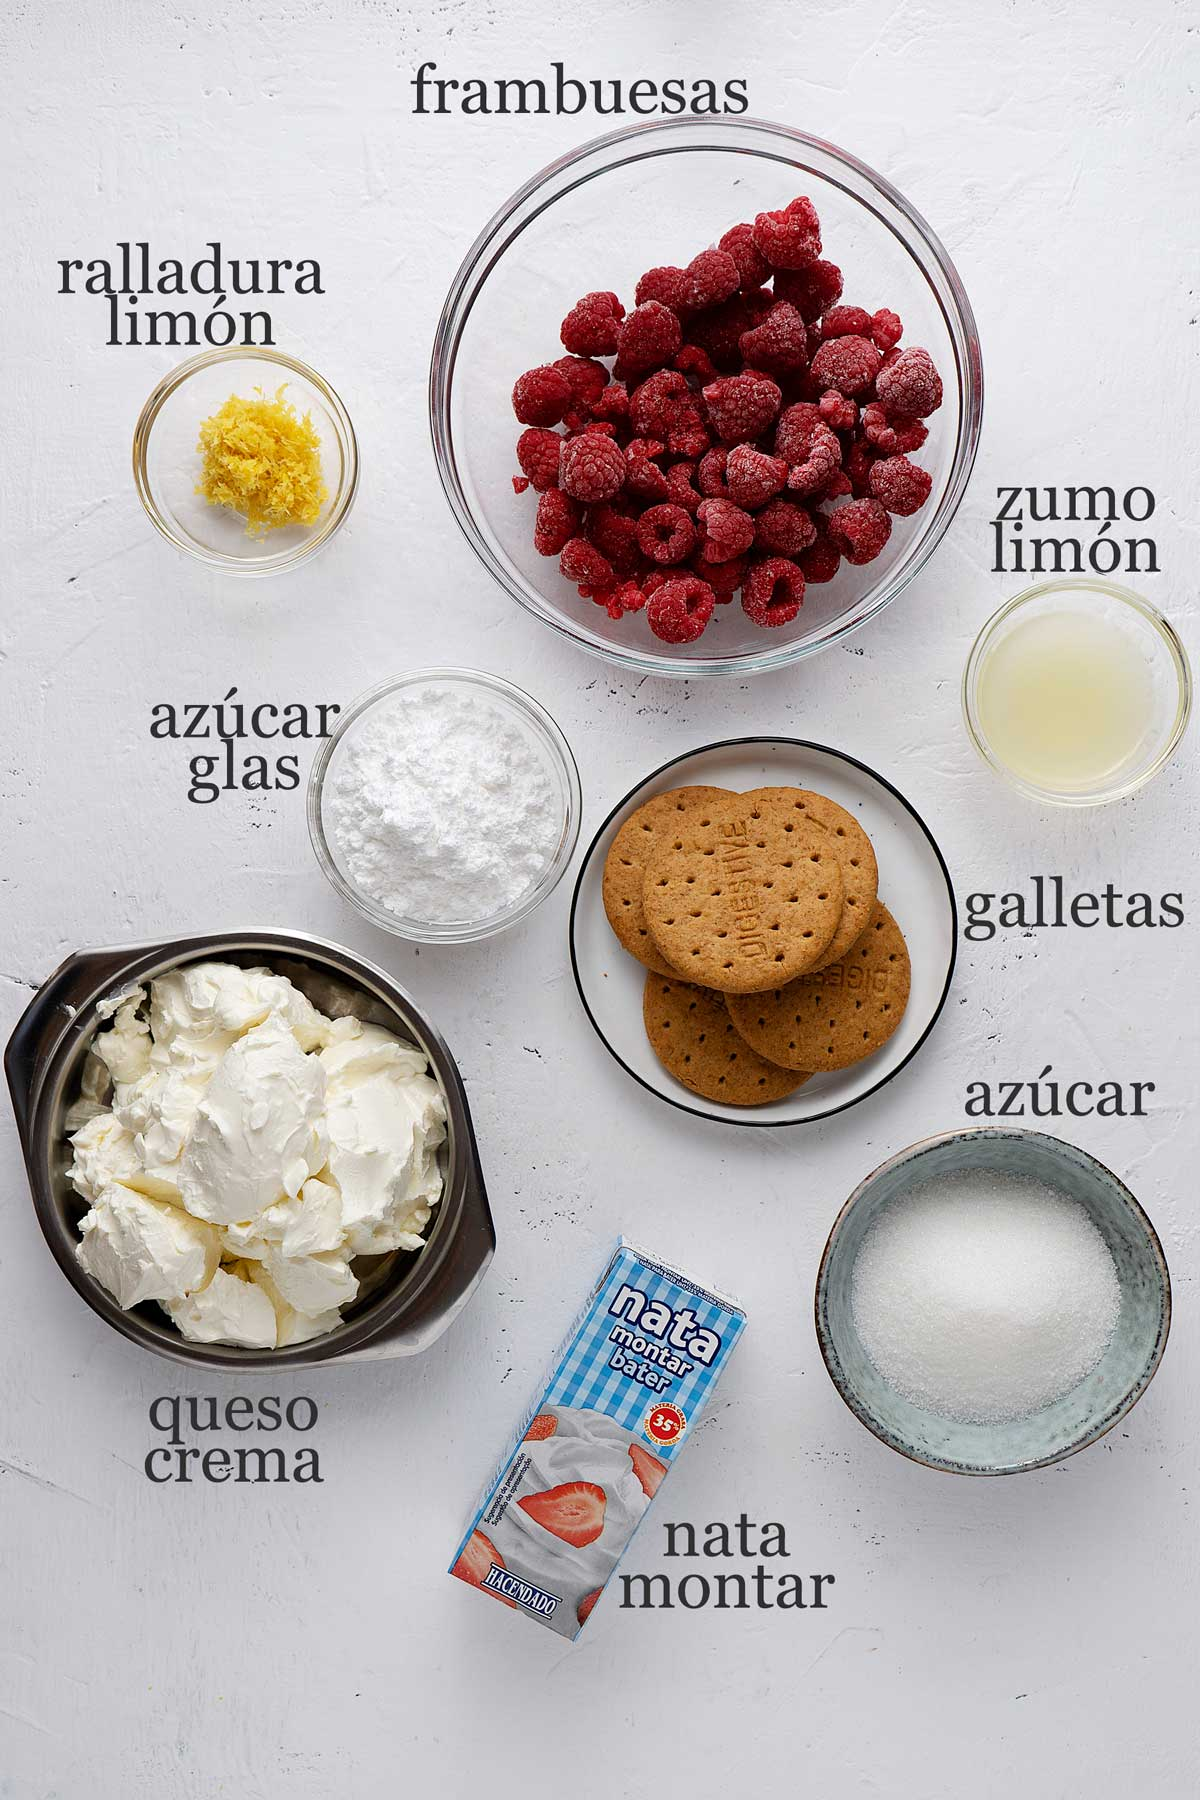 ingredientes para cheesecake de frambuesa en vasitos